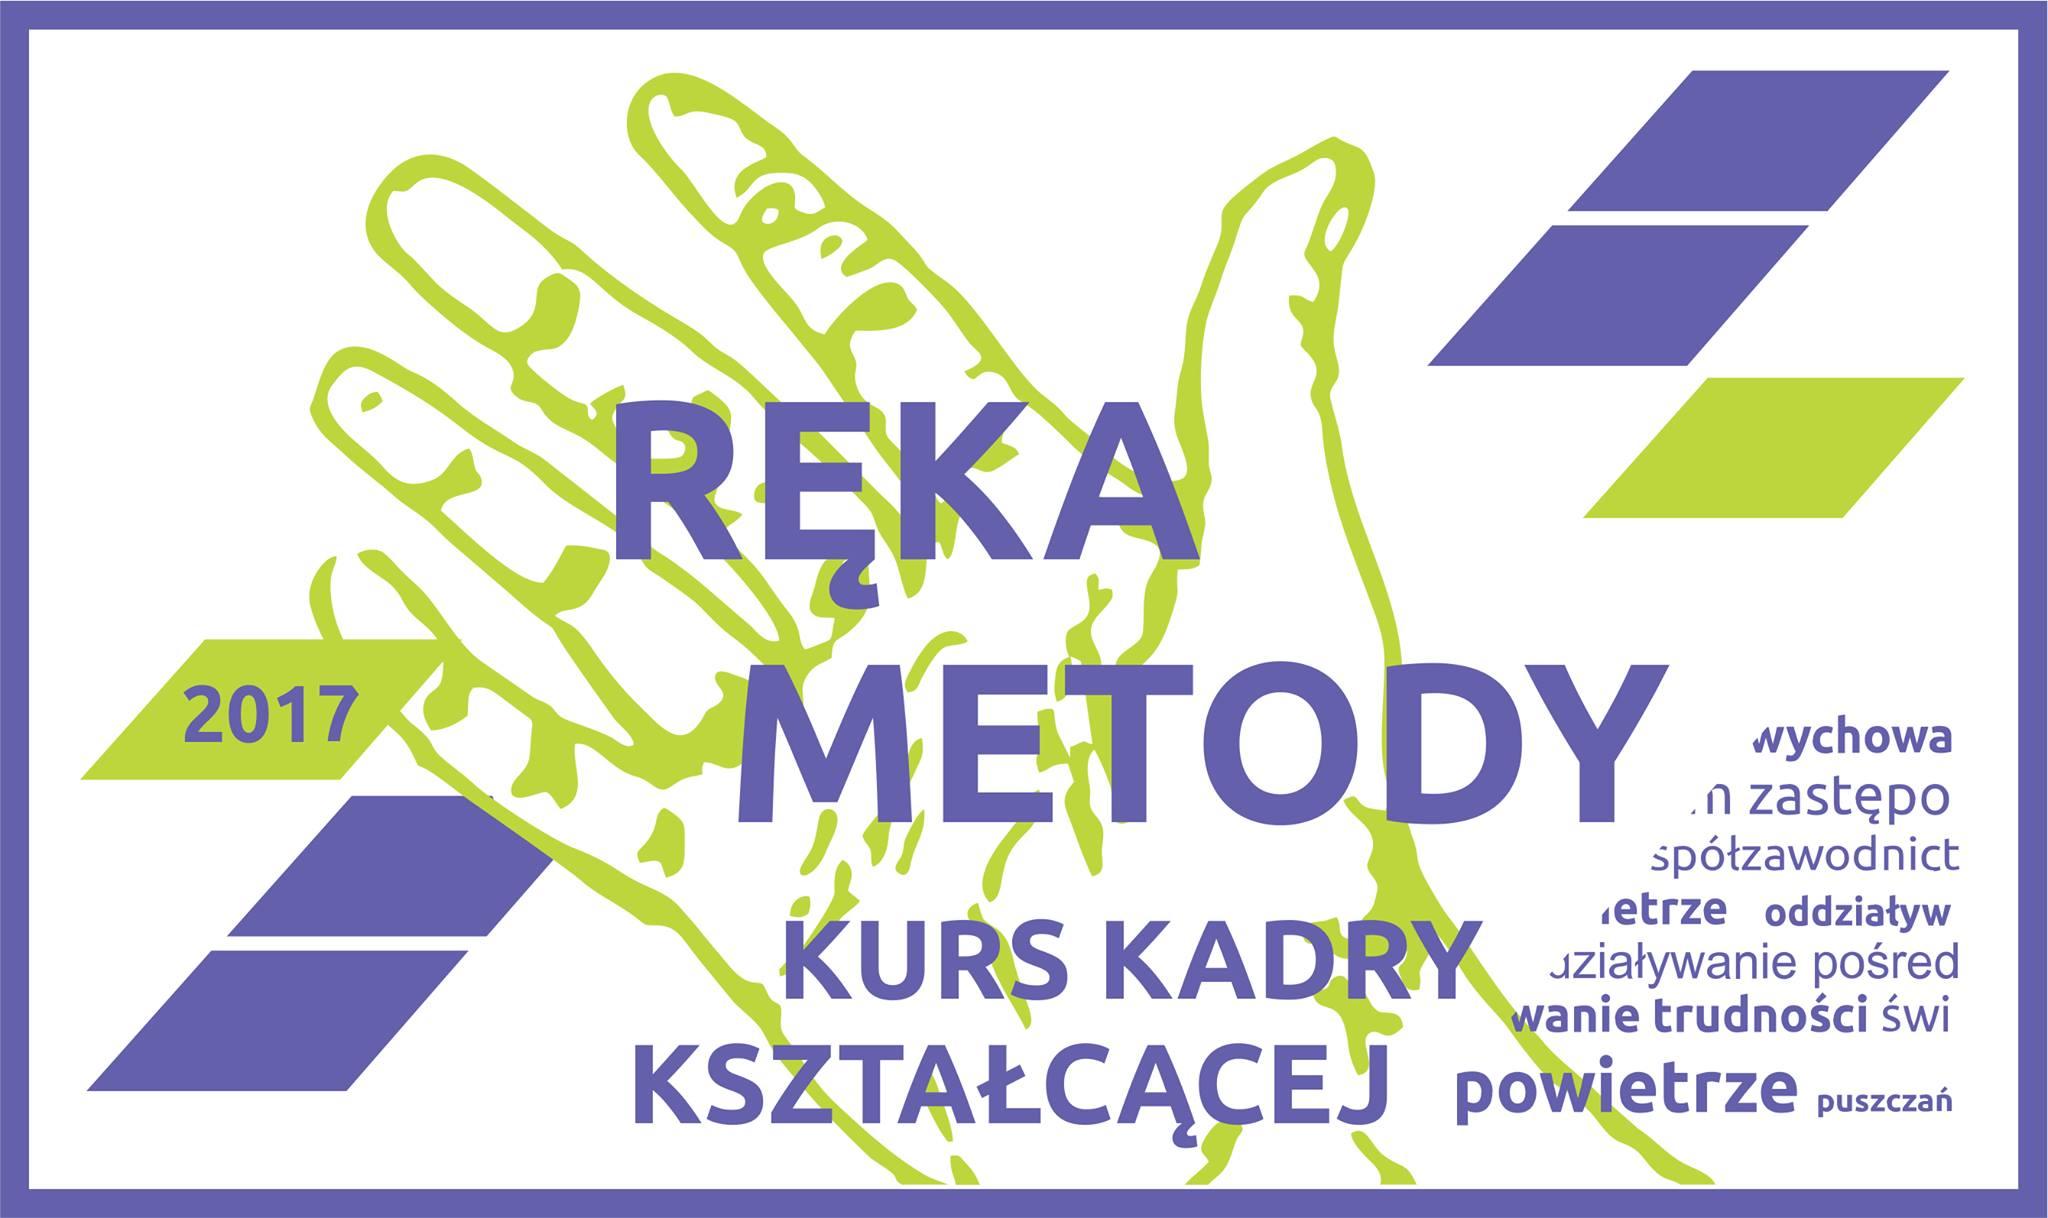 "Kurs Kadry Kształcącej ""Ręka Metody"" 2017"